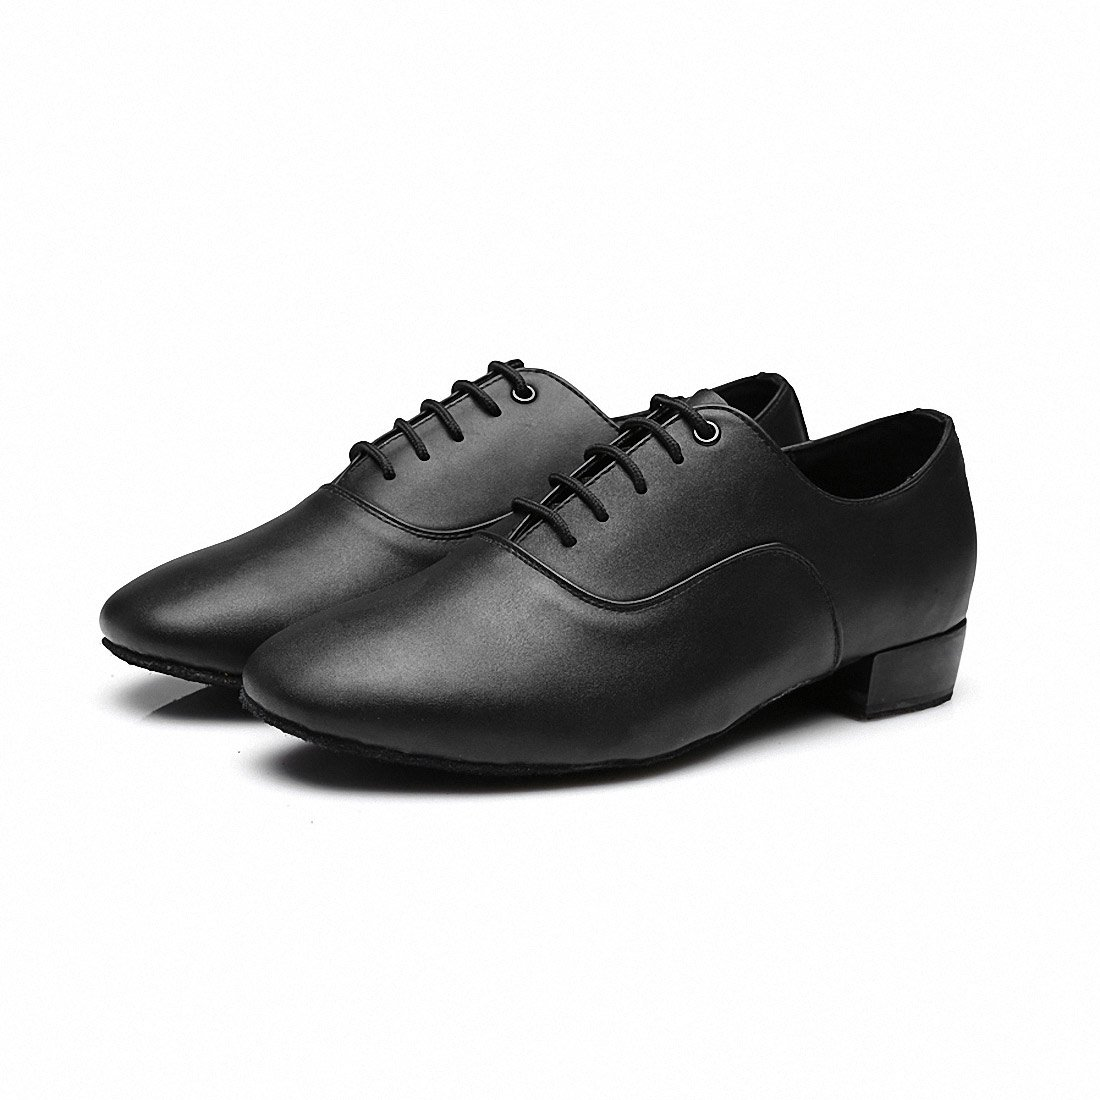 MQ - Zapatillas de Danza para Hombre Negro Negro, Color Negro, Talla 42.5 SANSHA 707A-44